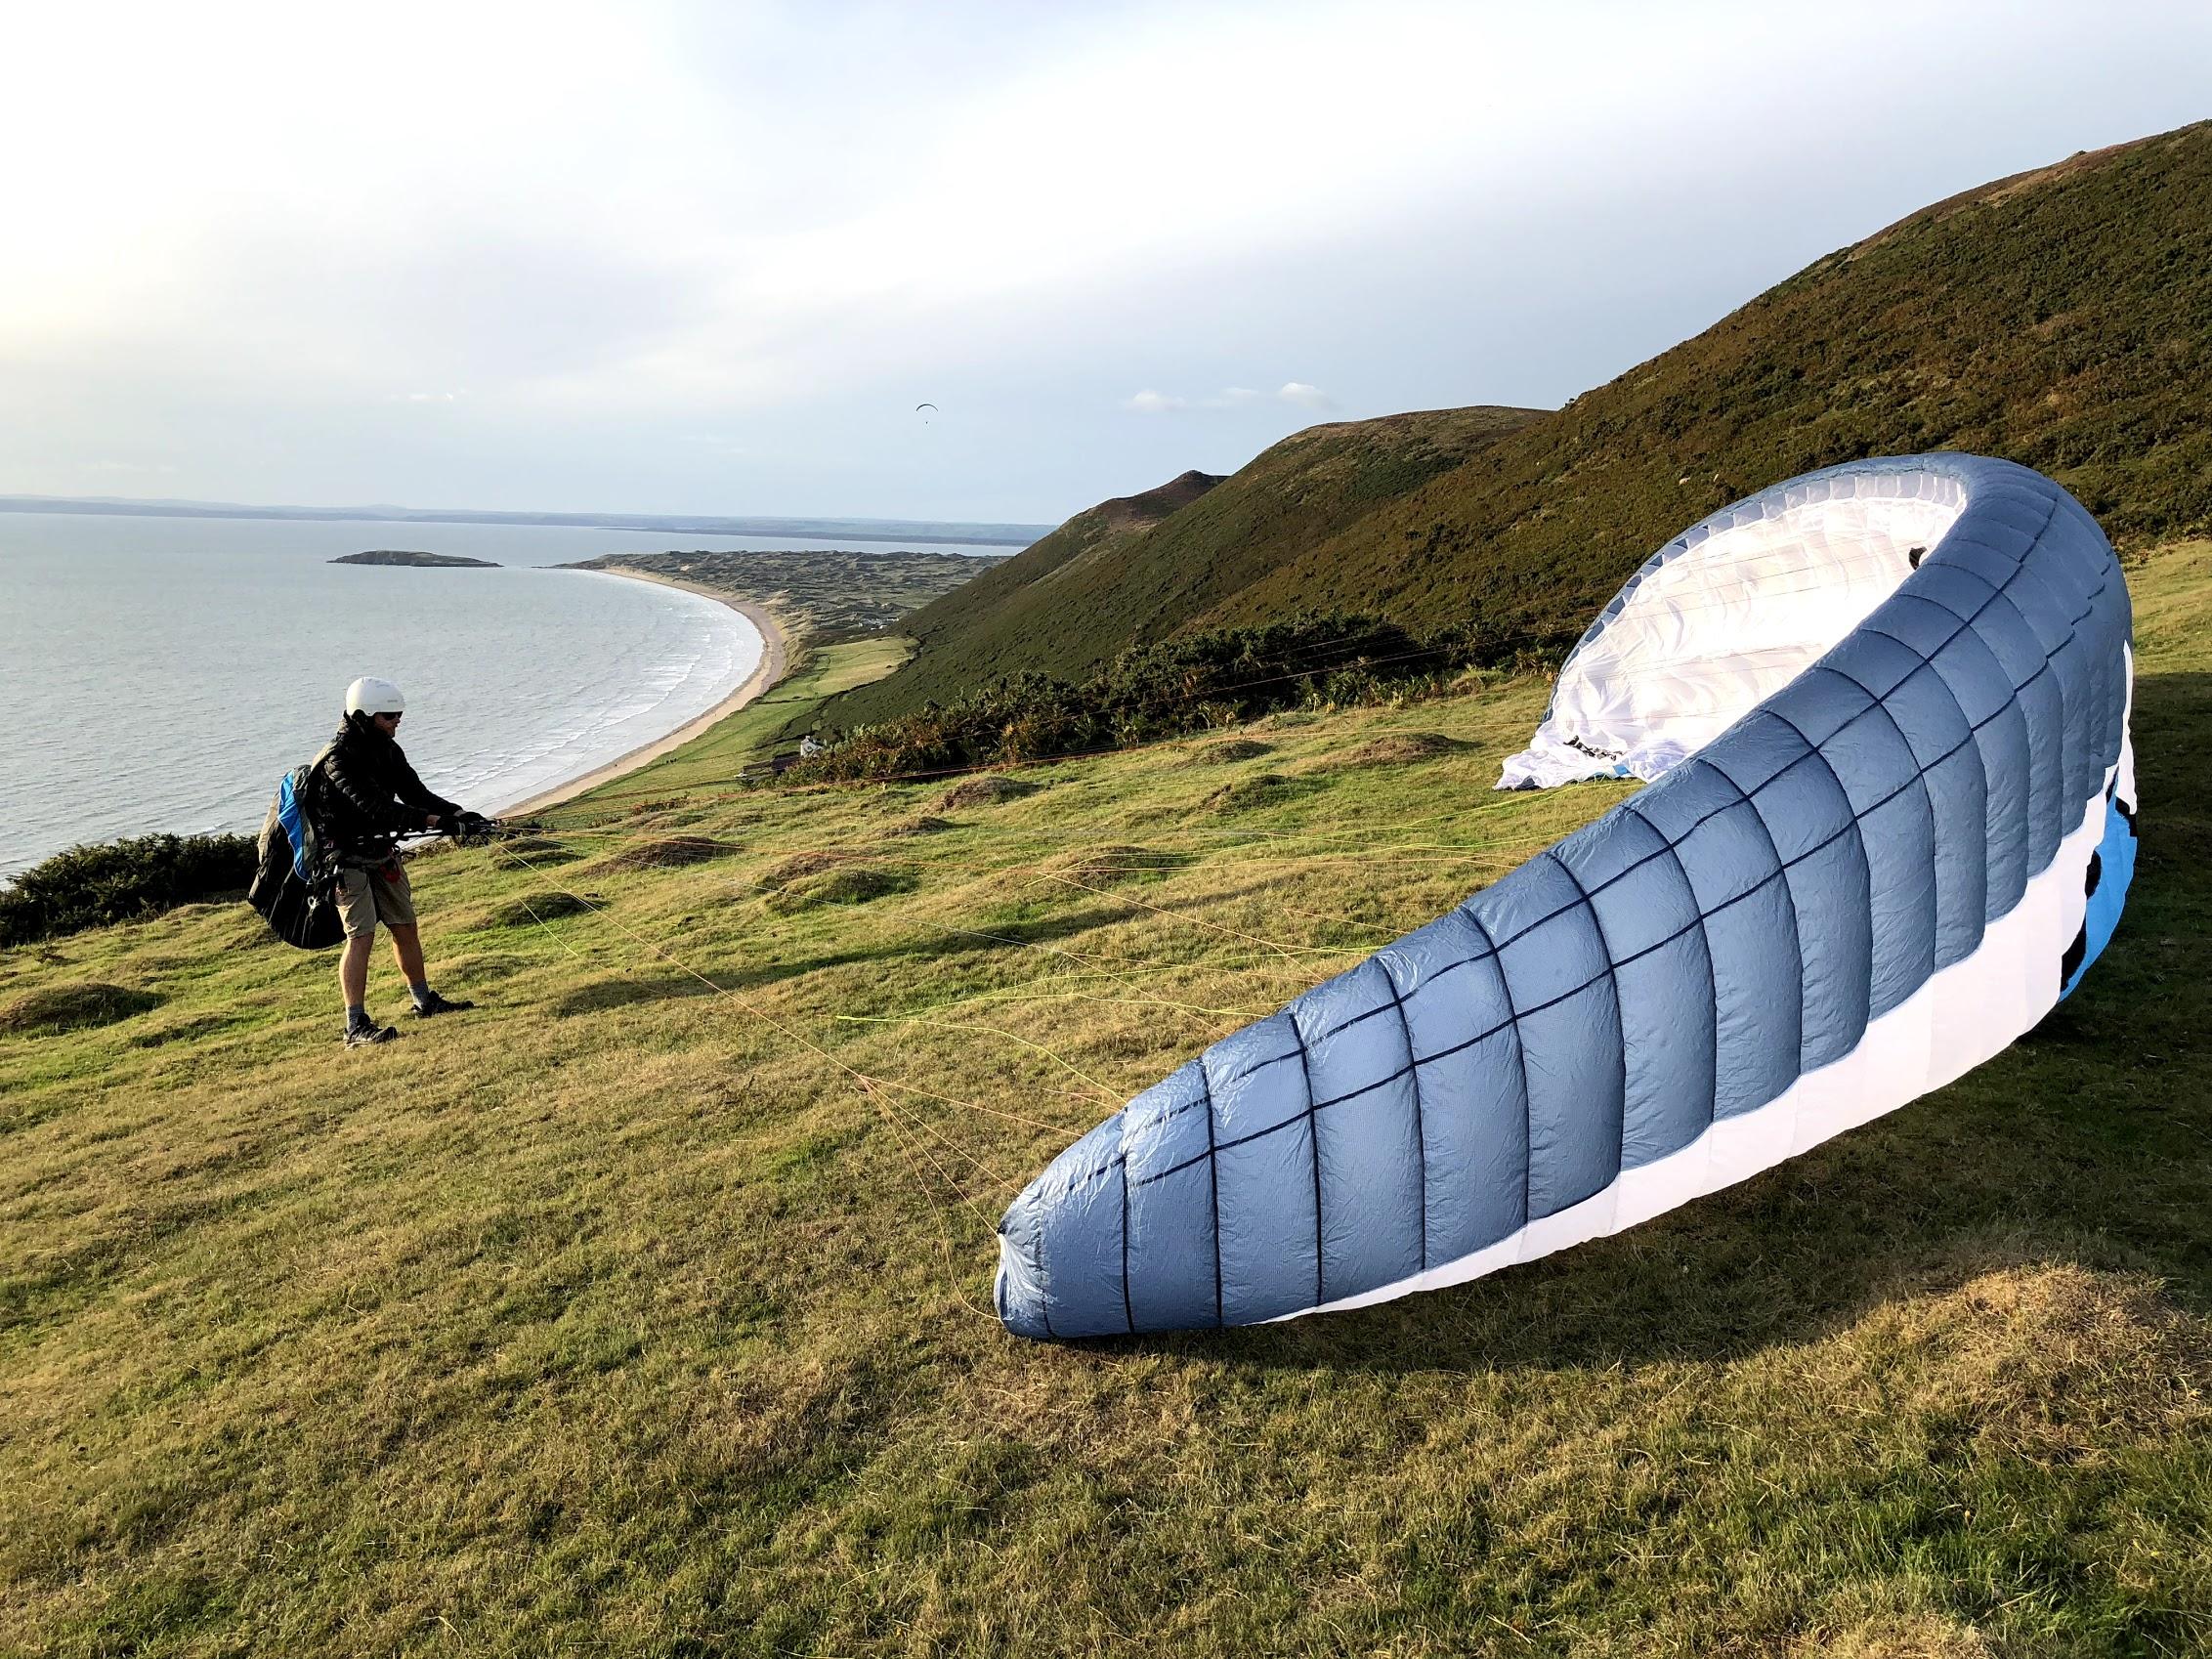 Paragliding at Rhossili